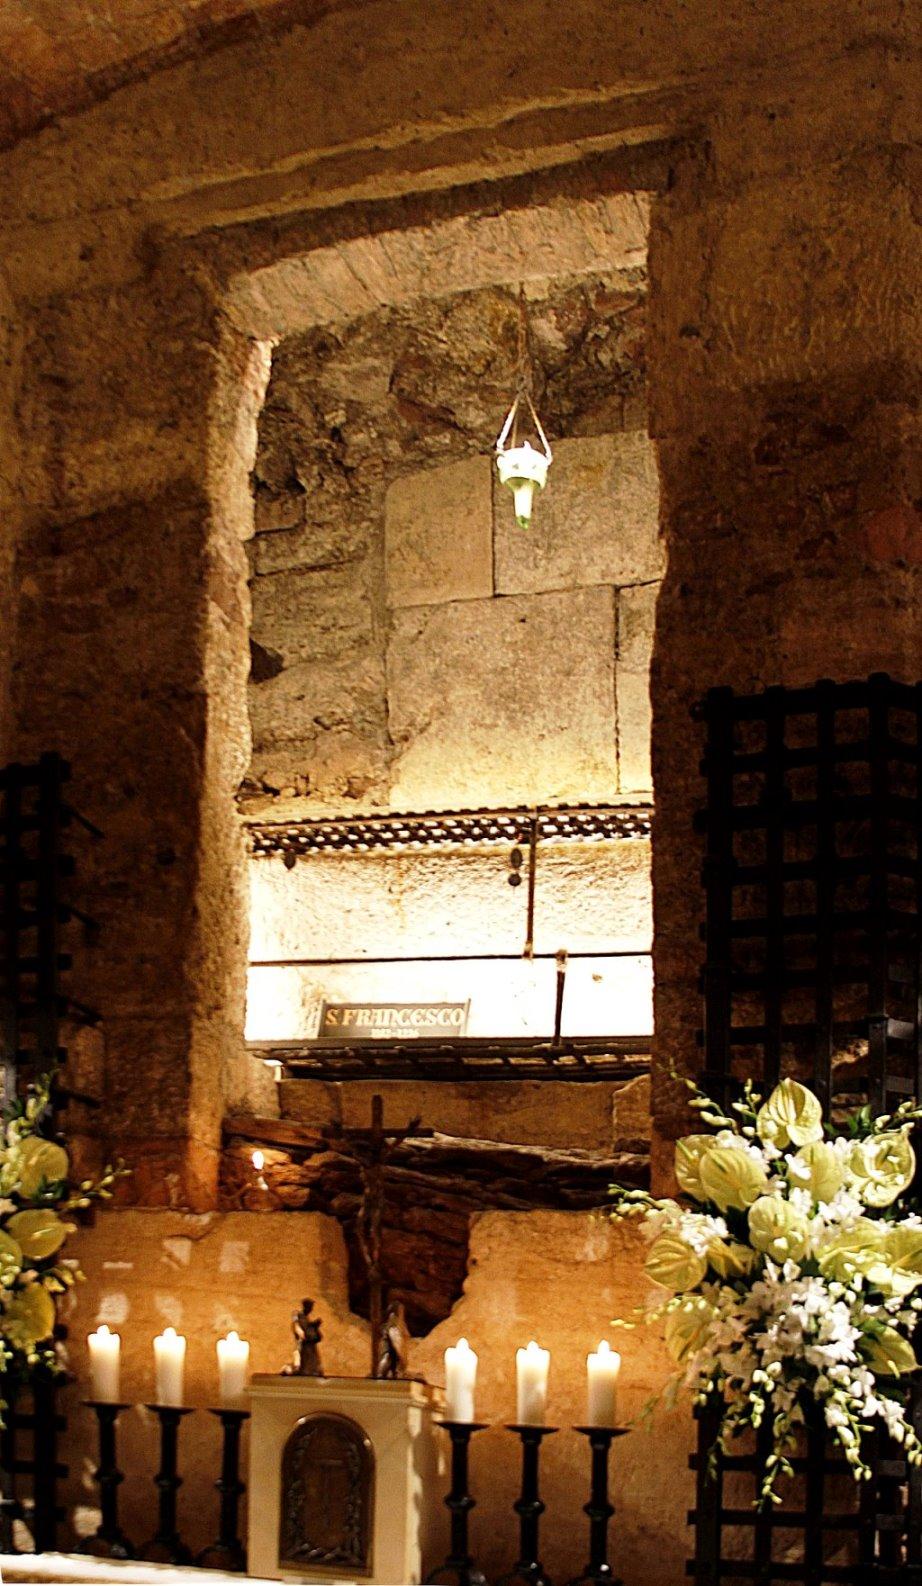 Franziskusgrab in der Basilika San Francesco in Assisi